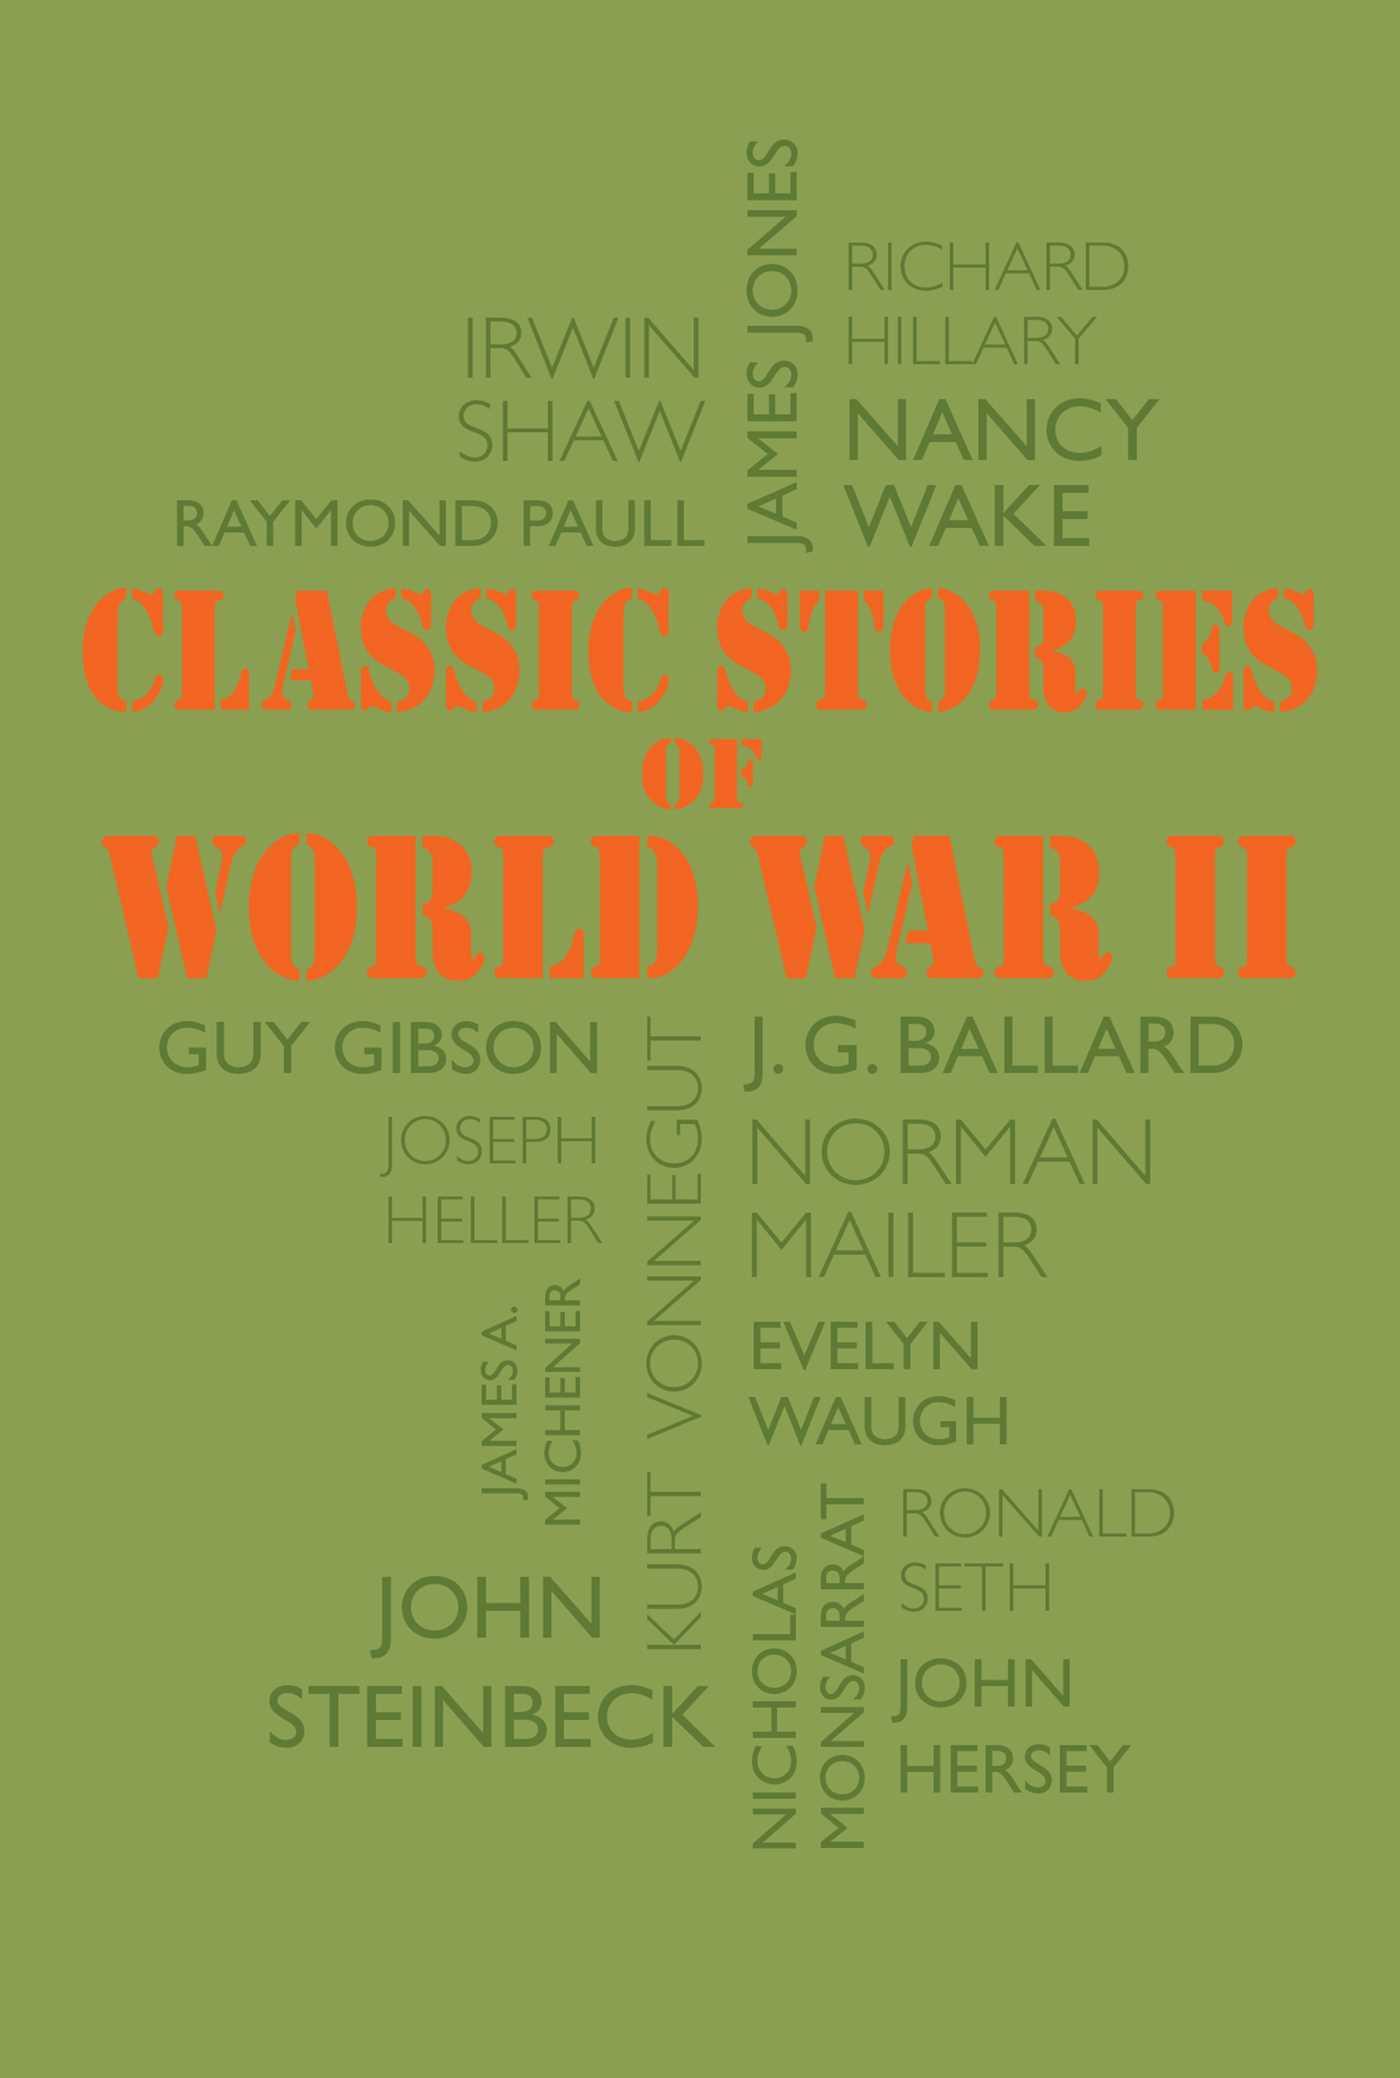 Classic stories of world war ii 9781684124220 hr